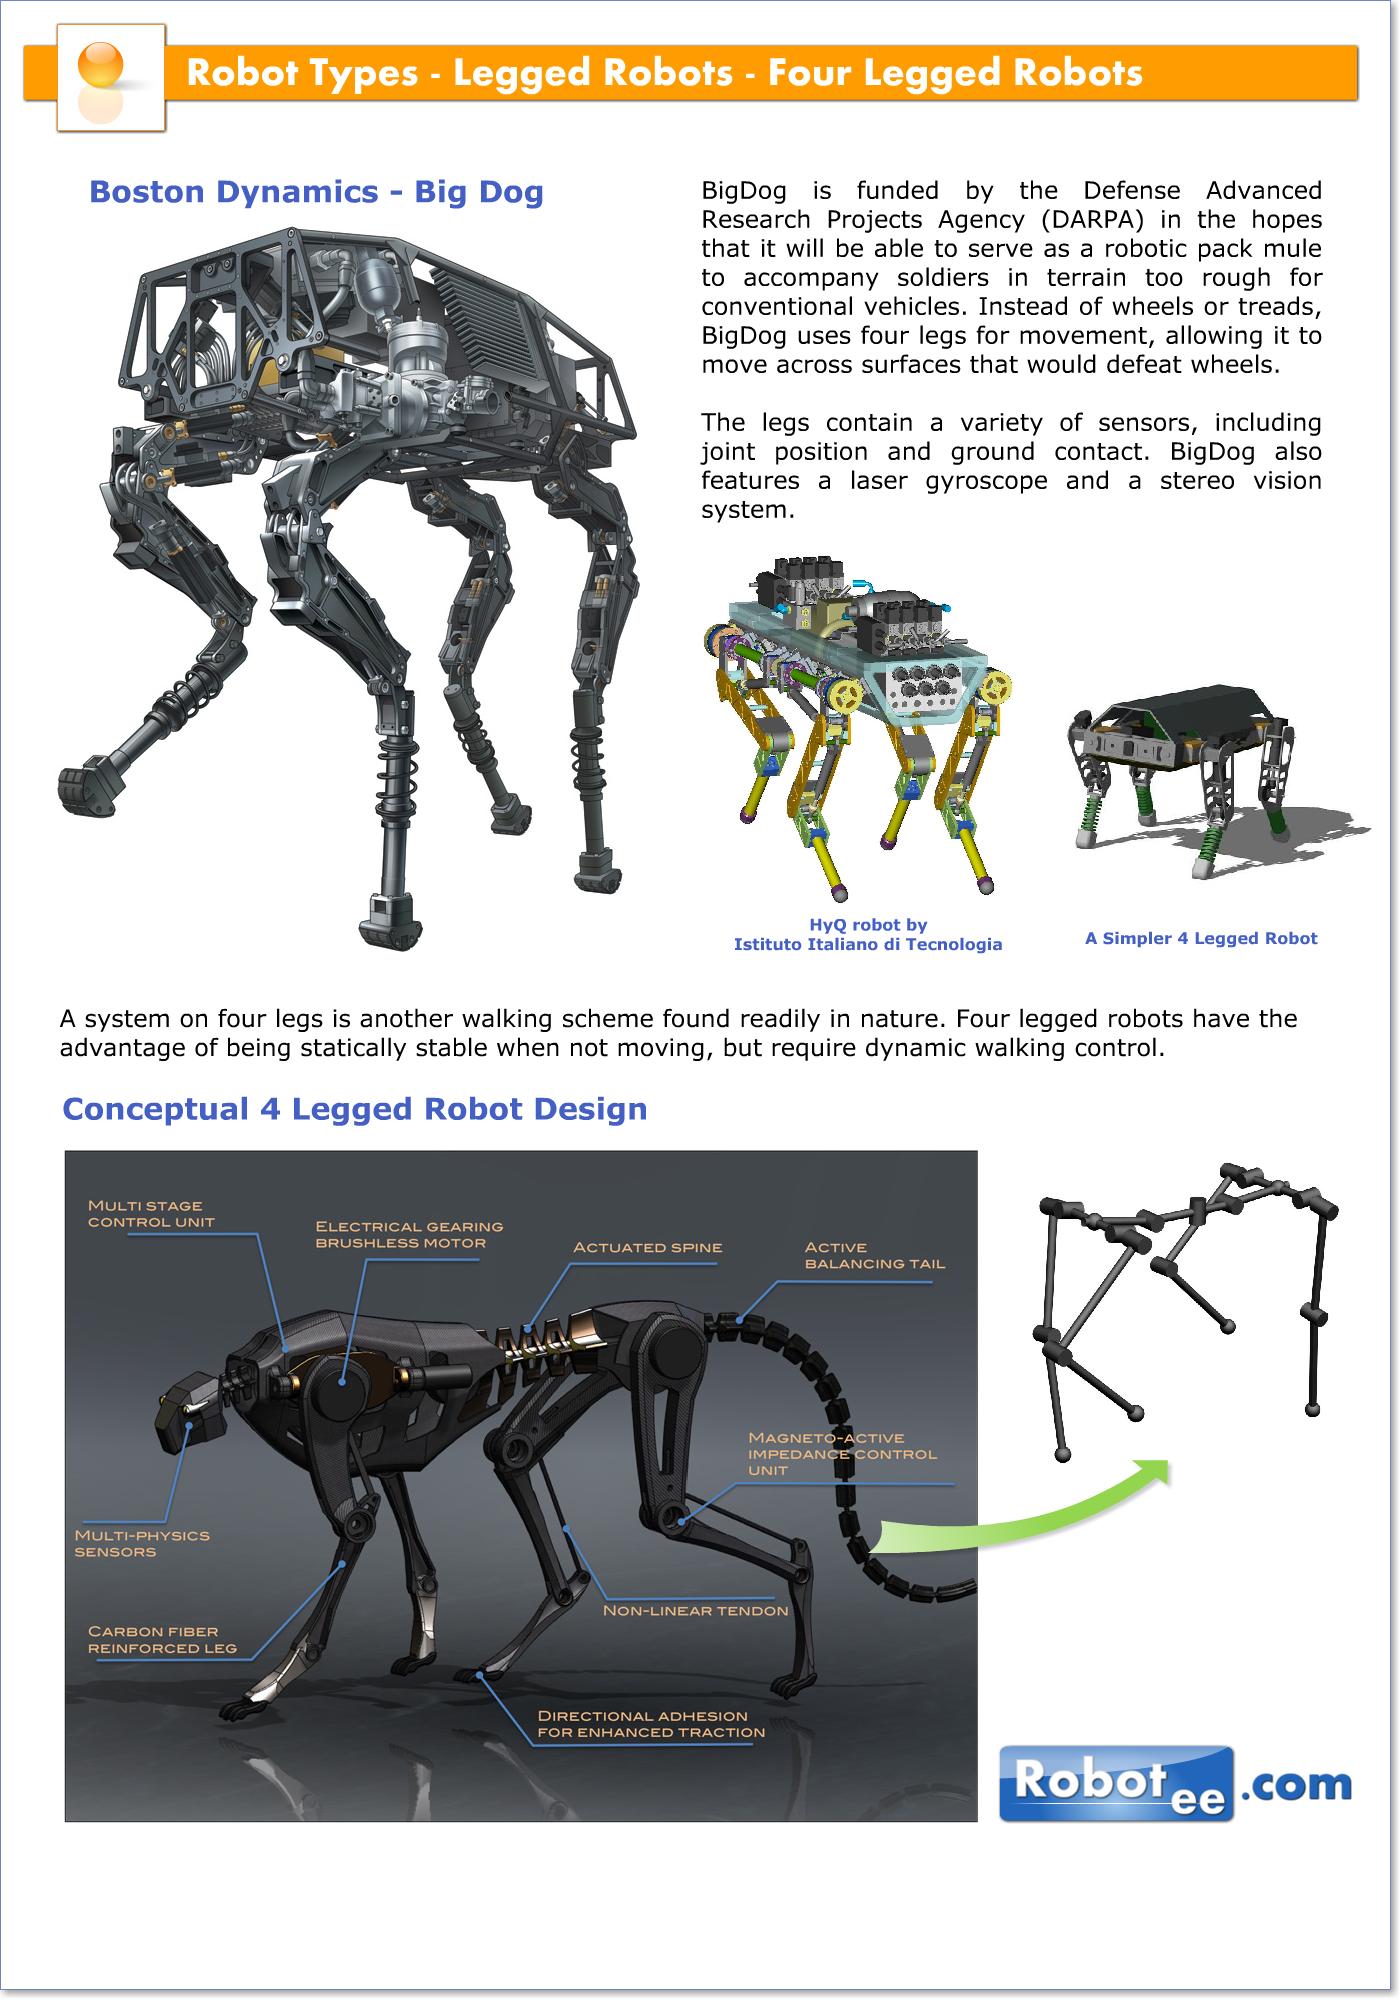 Four Legged Robots Robotpark Academy